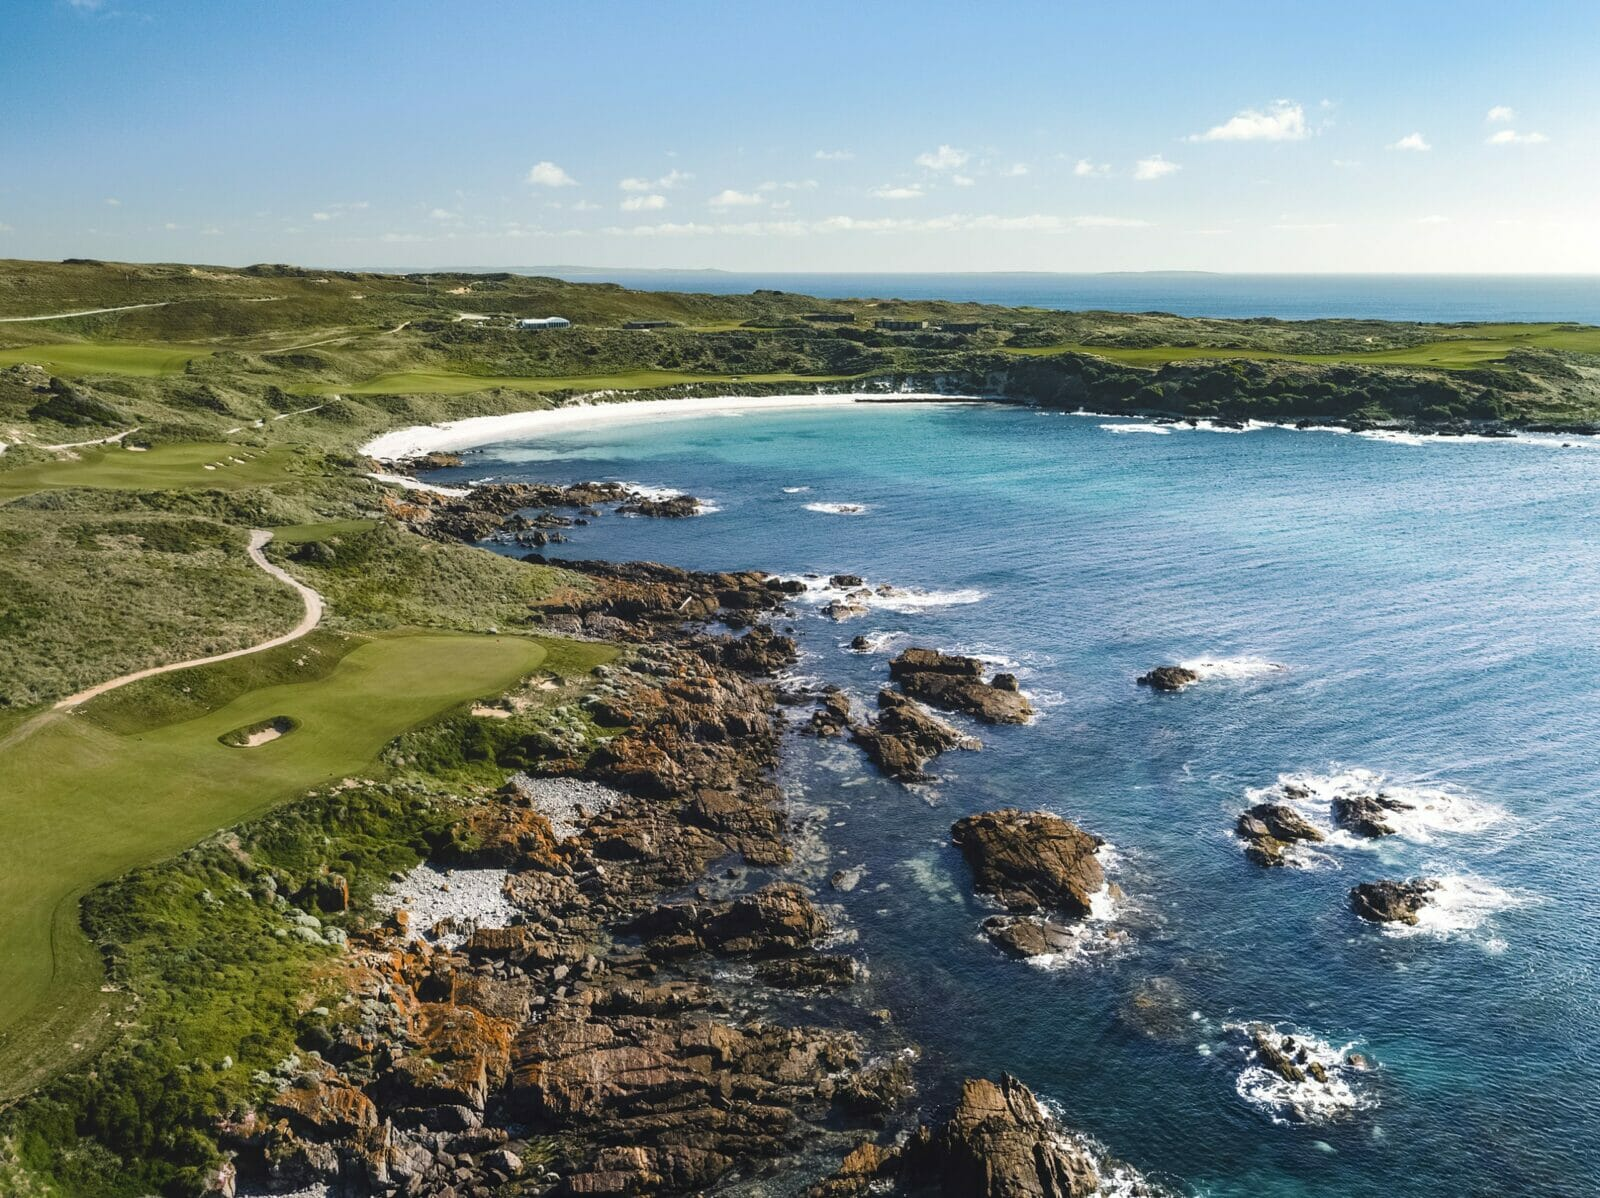 Cape Wickham golf course and ocean